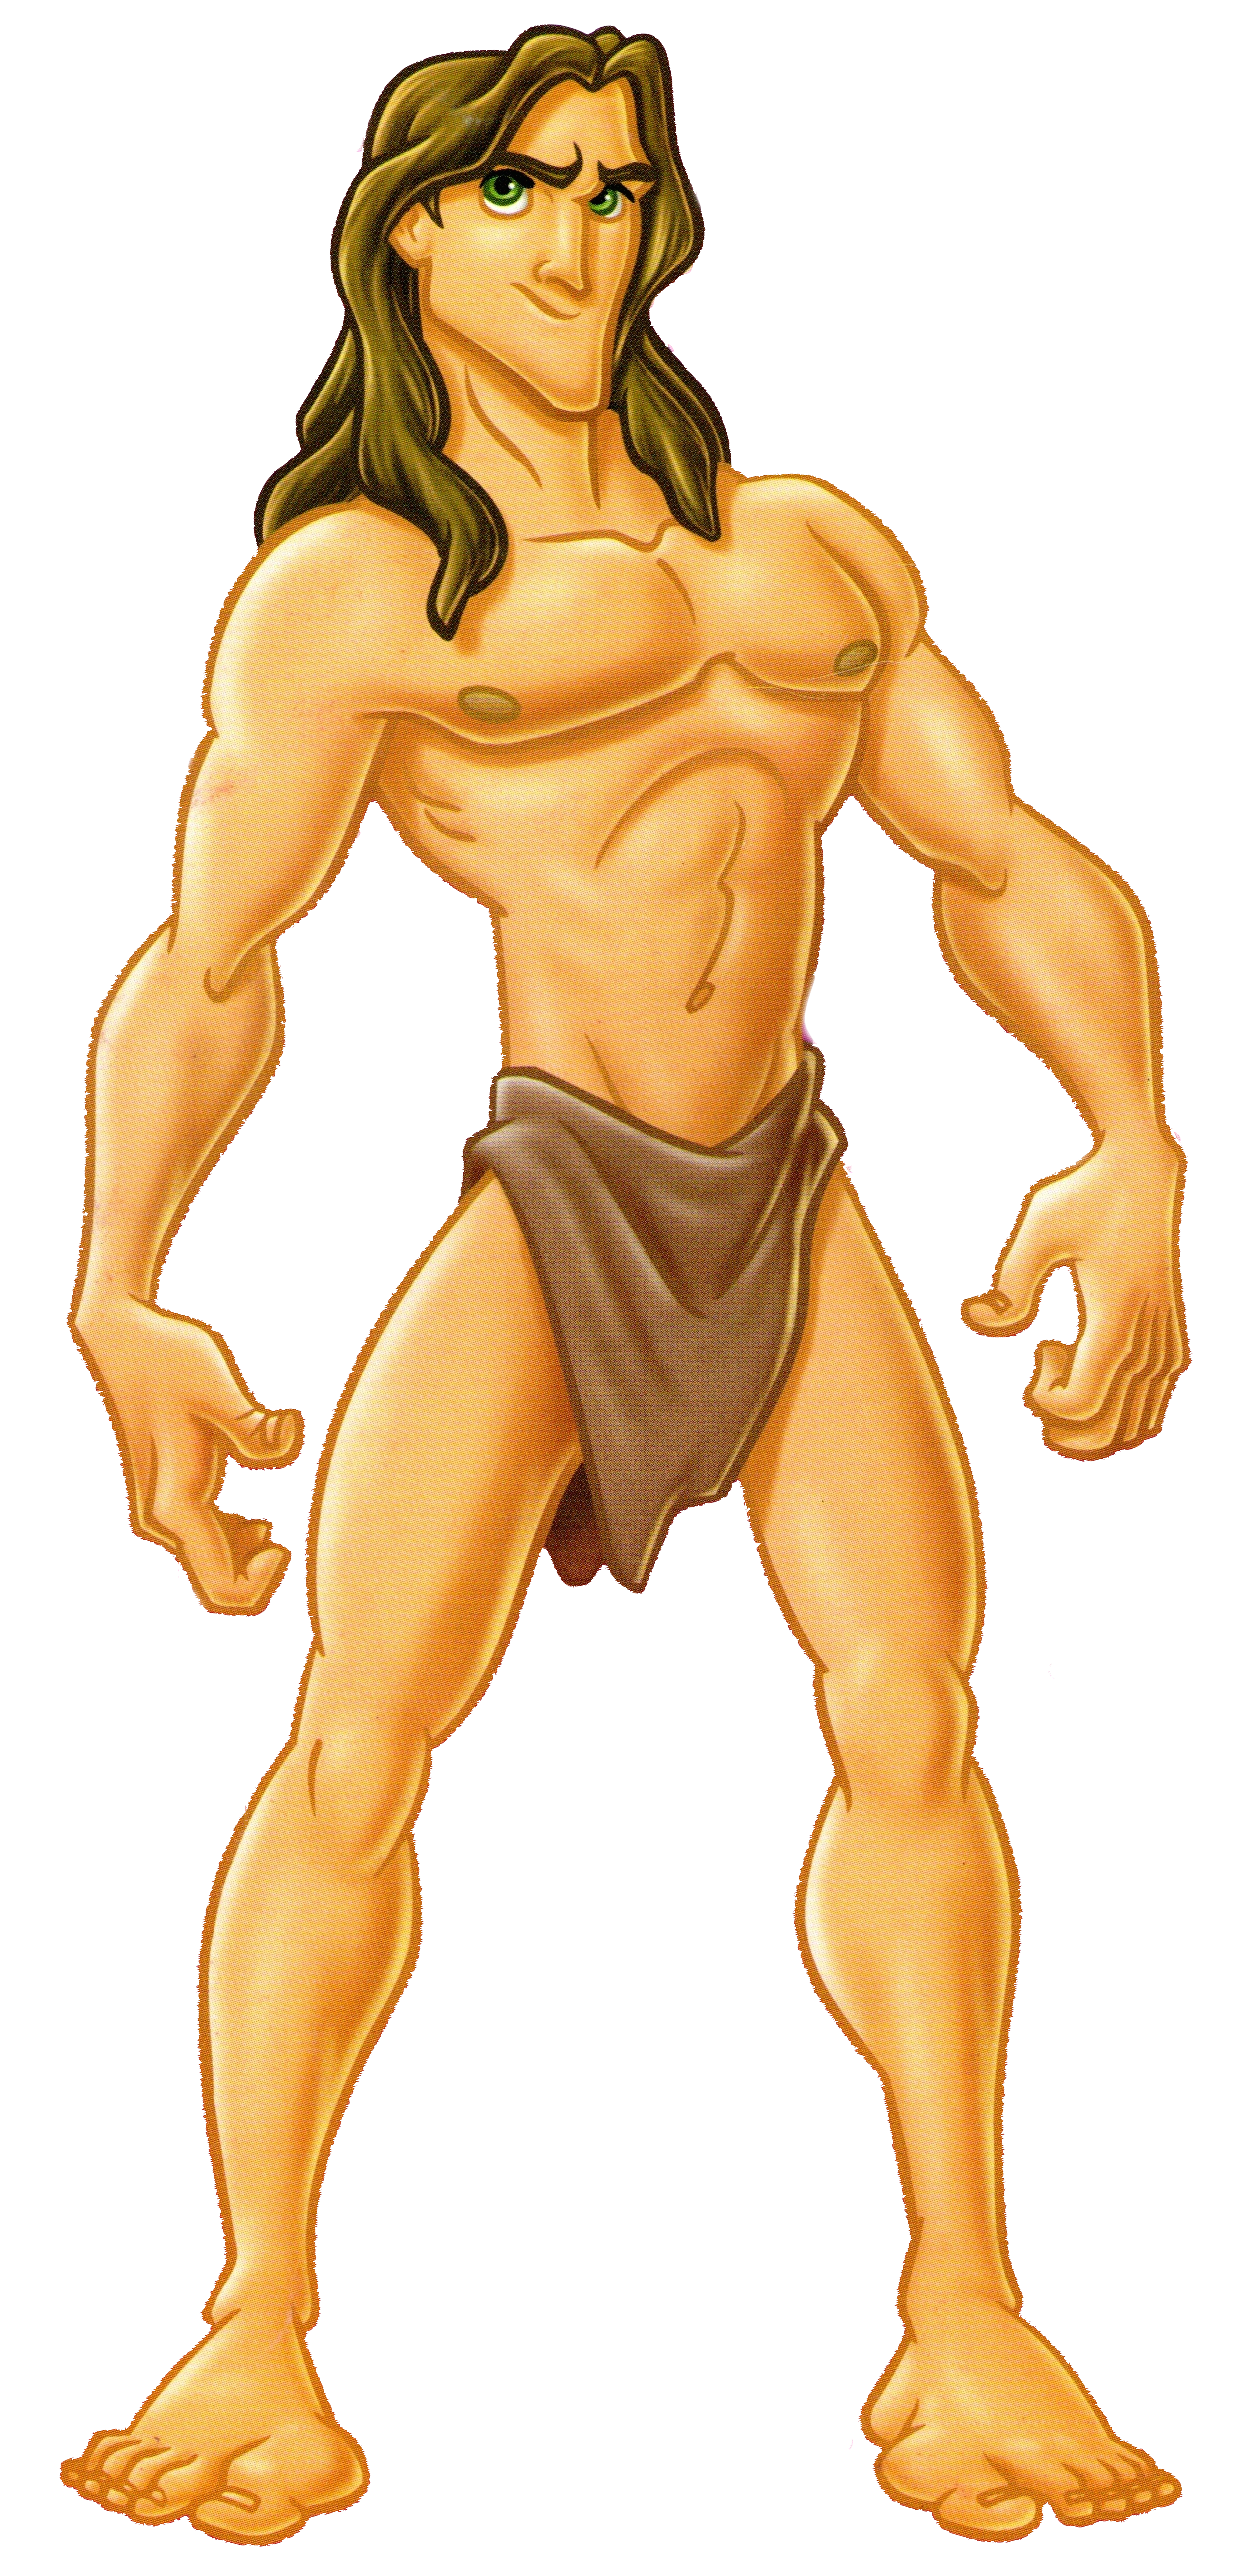 Images of Tarzan | 1236x2560